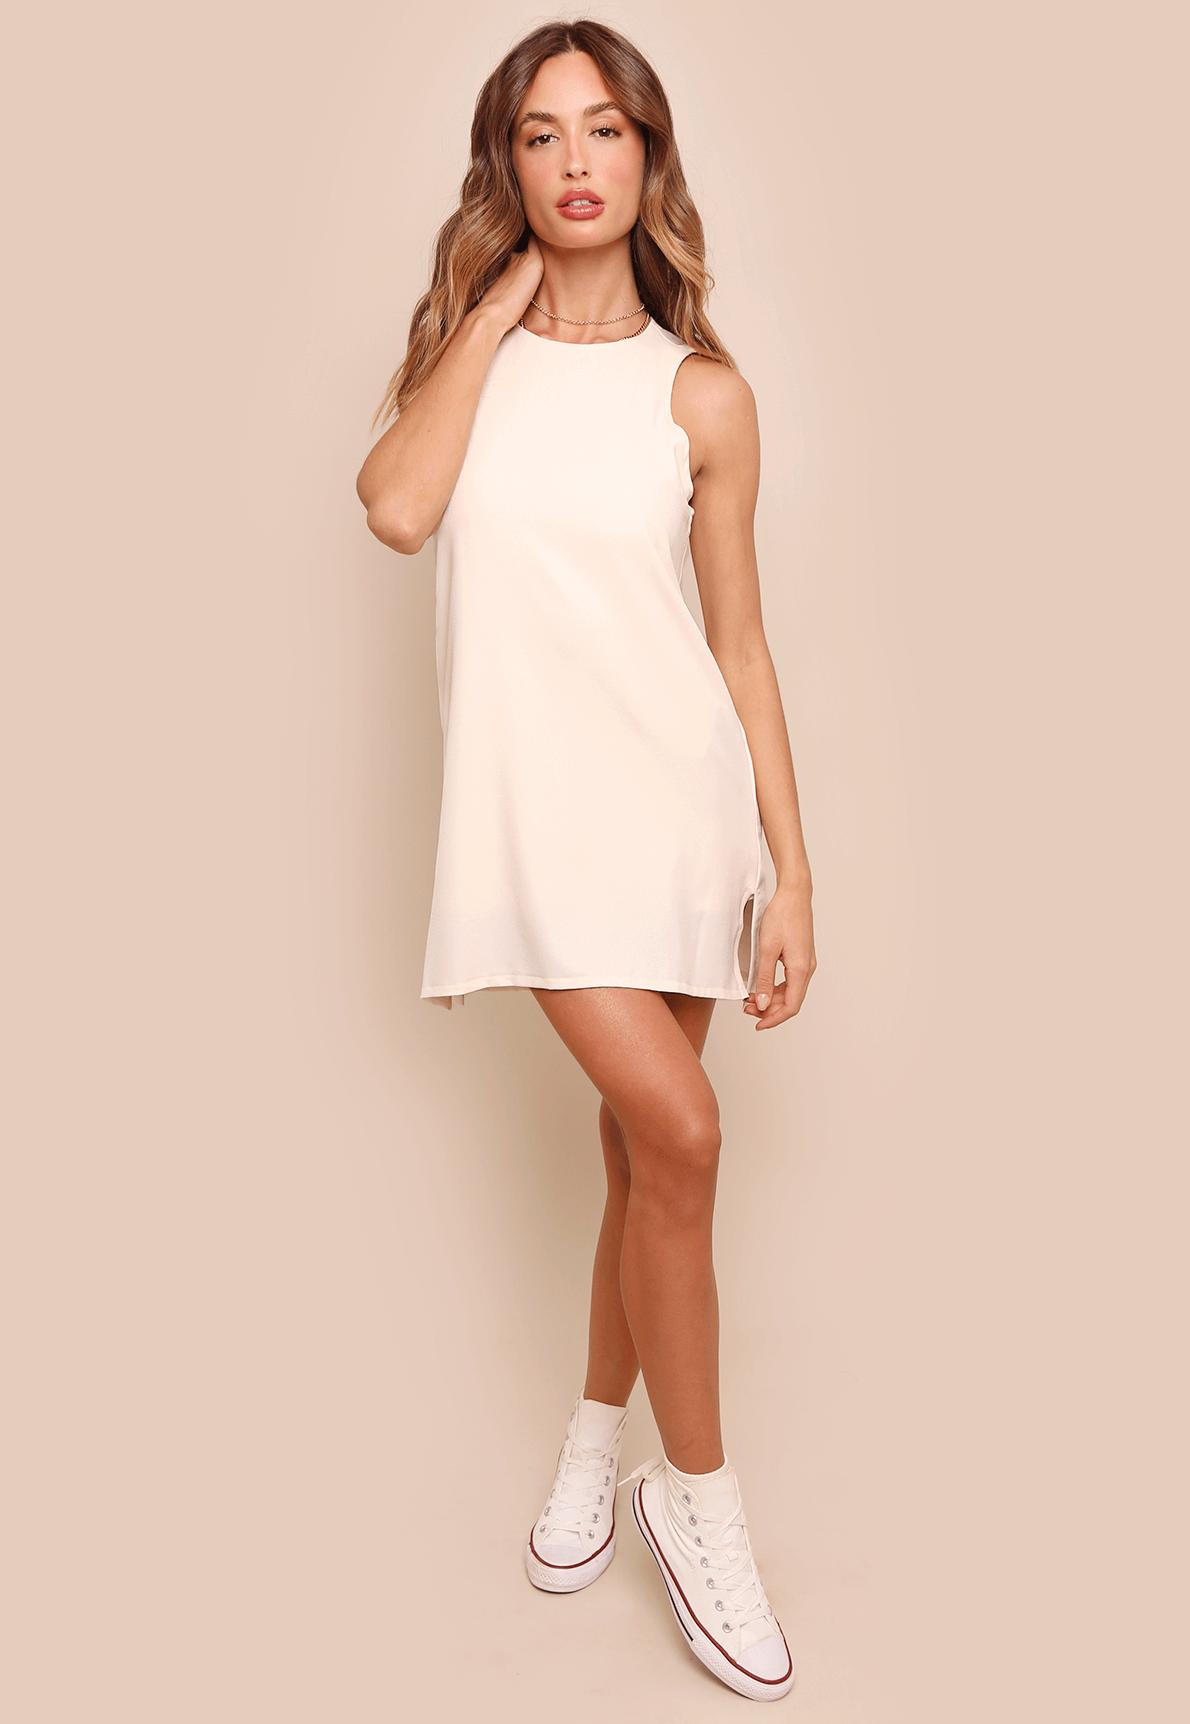 34880-vestido-gabriela-off-white-mundo-lolita-02